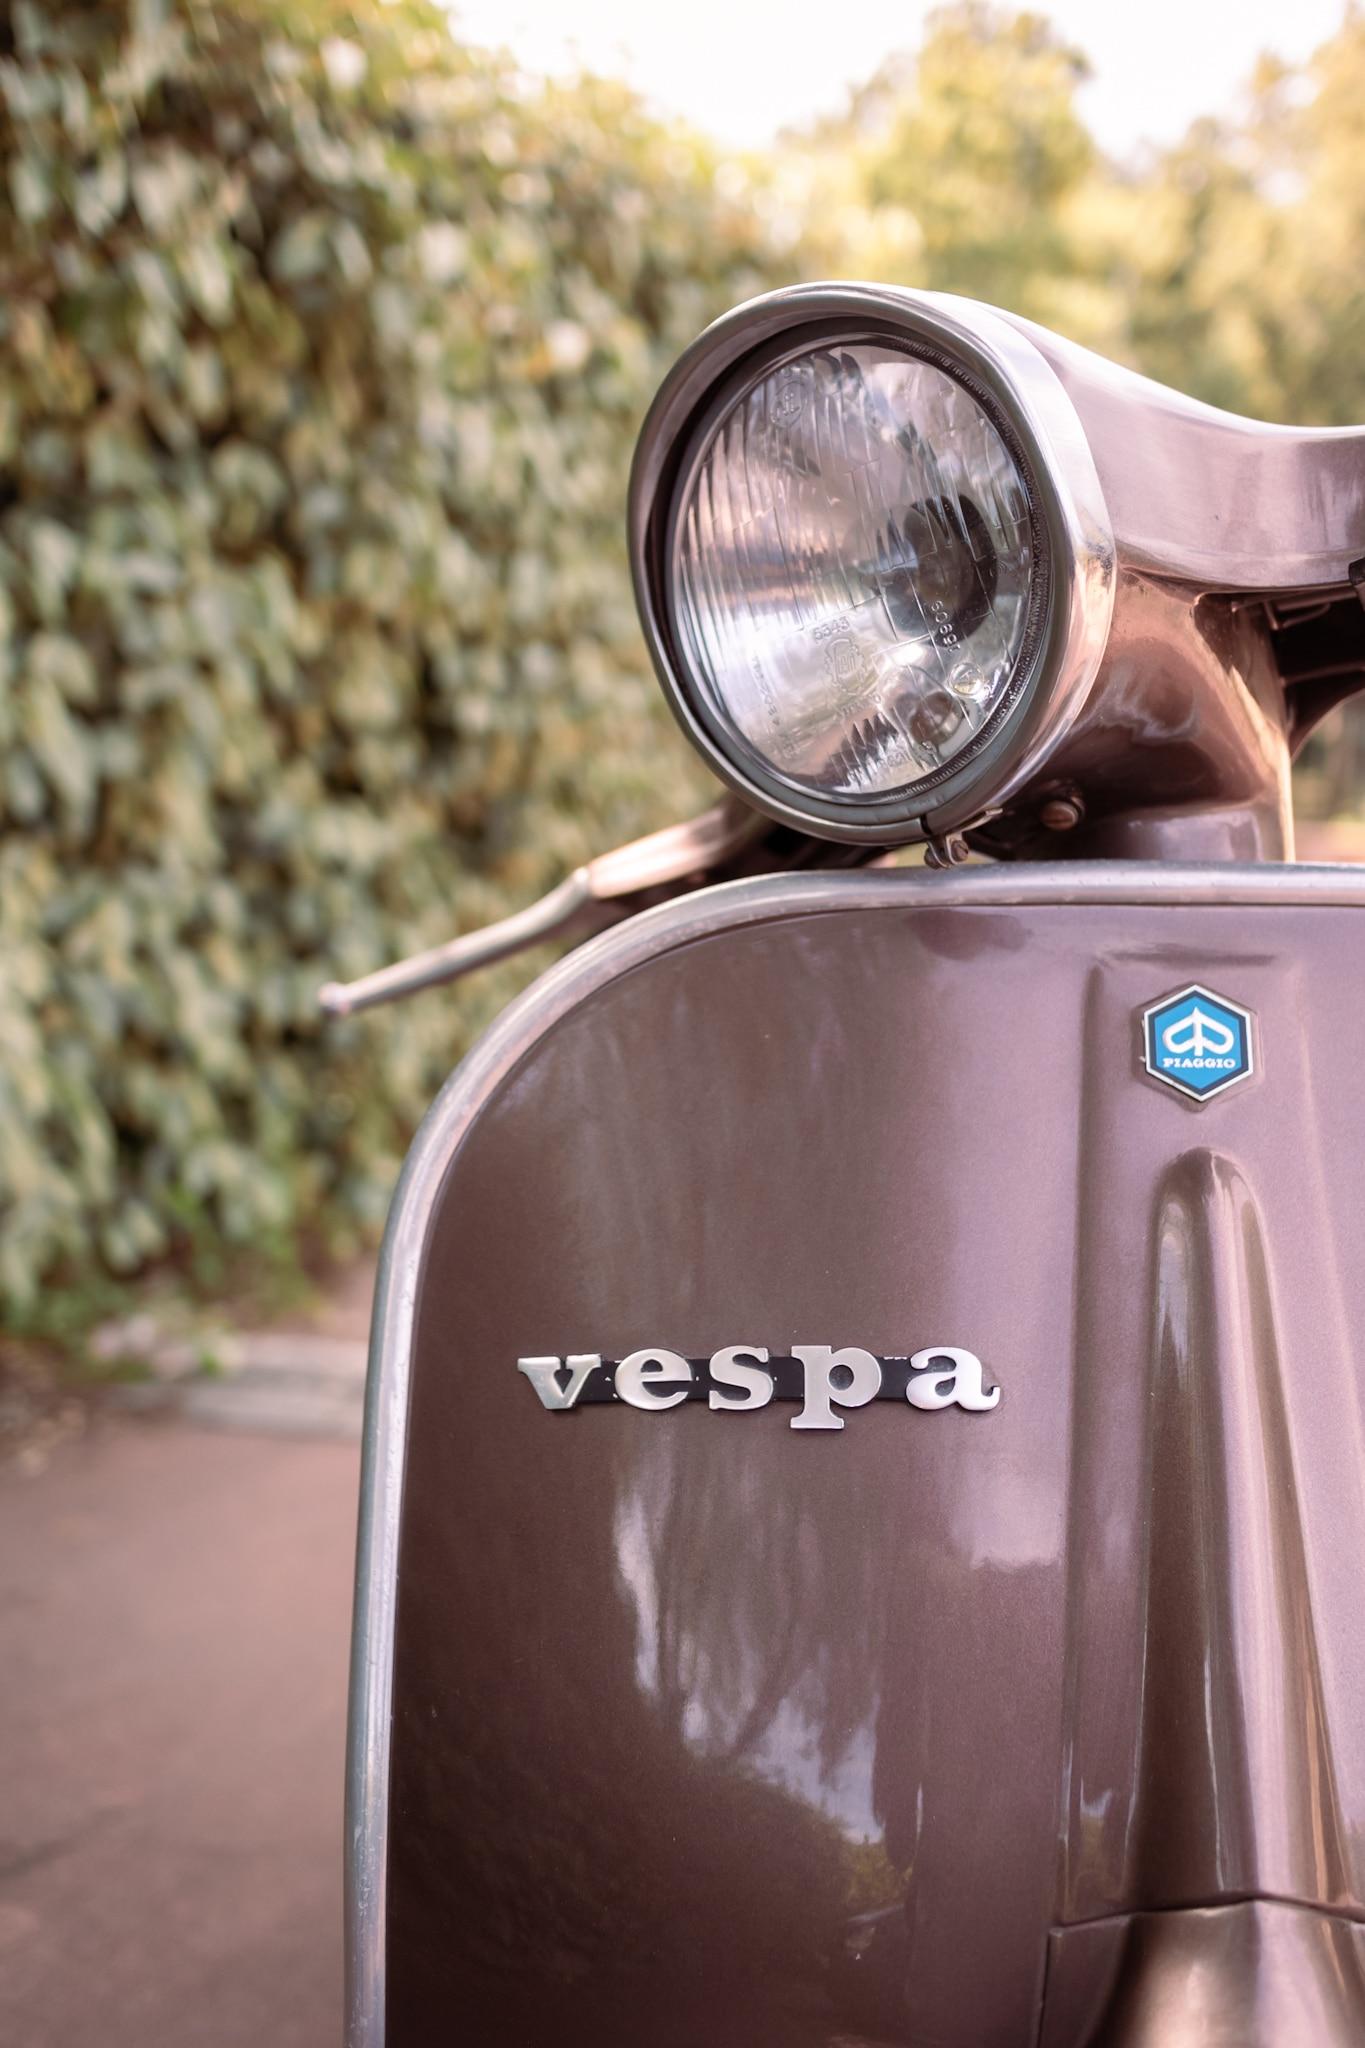 www.ridethewaves.it - Sardegna in vespa